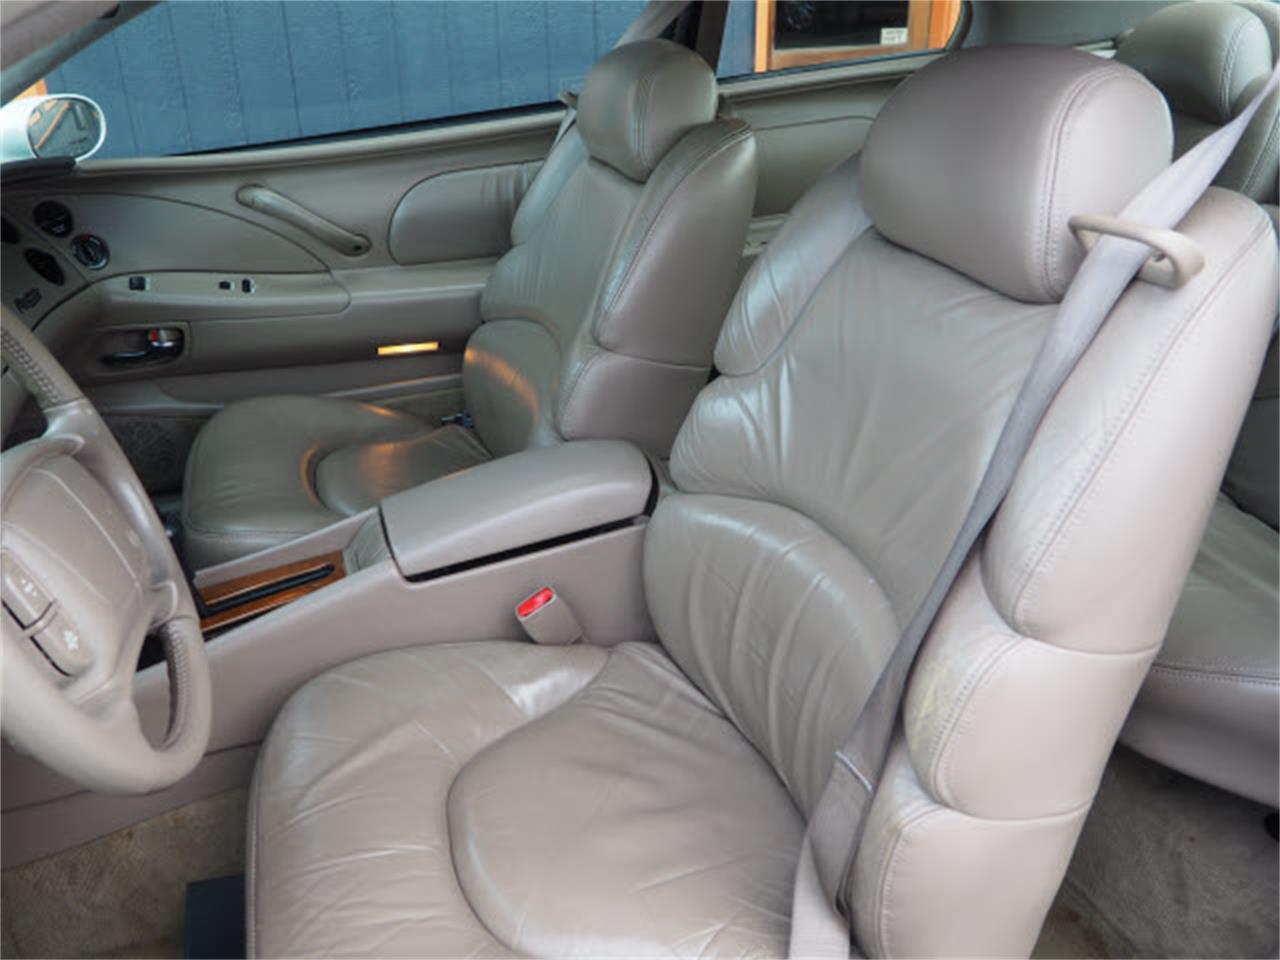 1999 Buick Riviera (CC-1322663) for sale in Tacoma, Washington